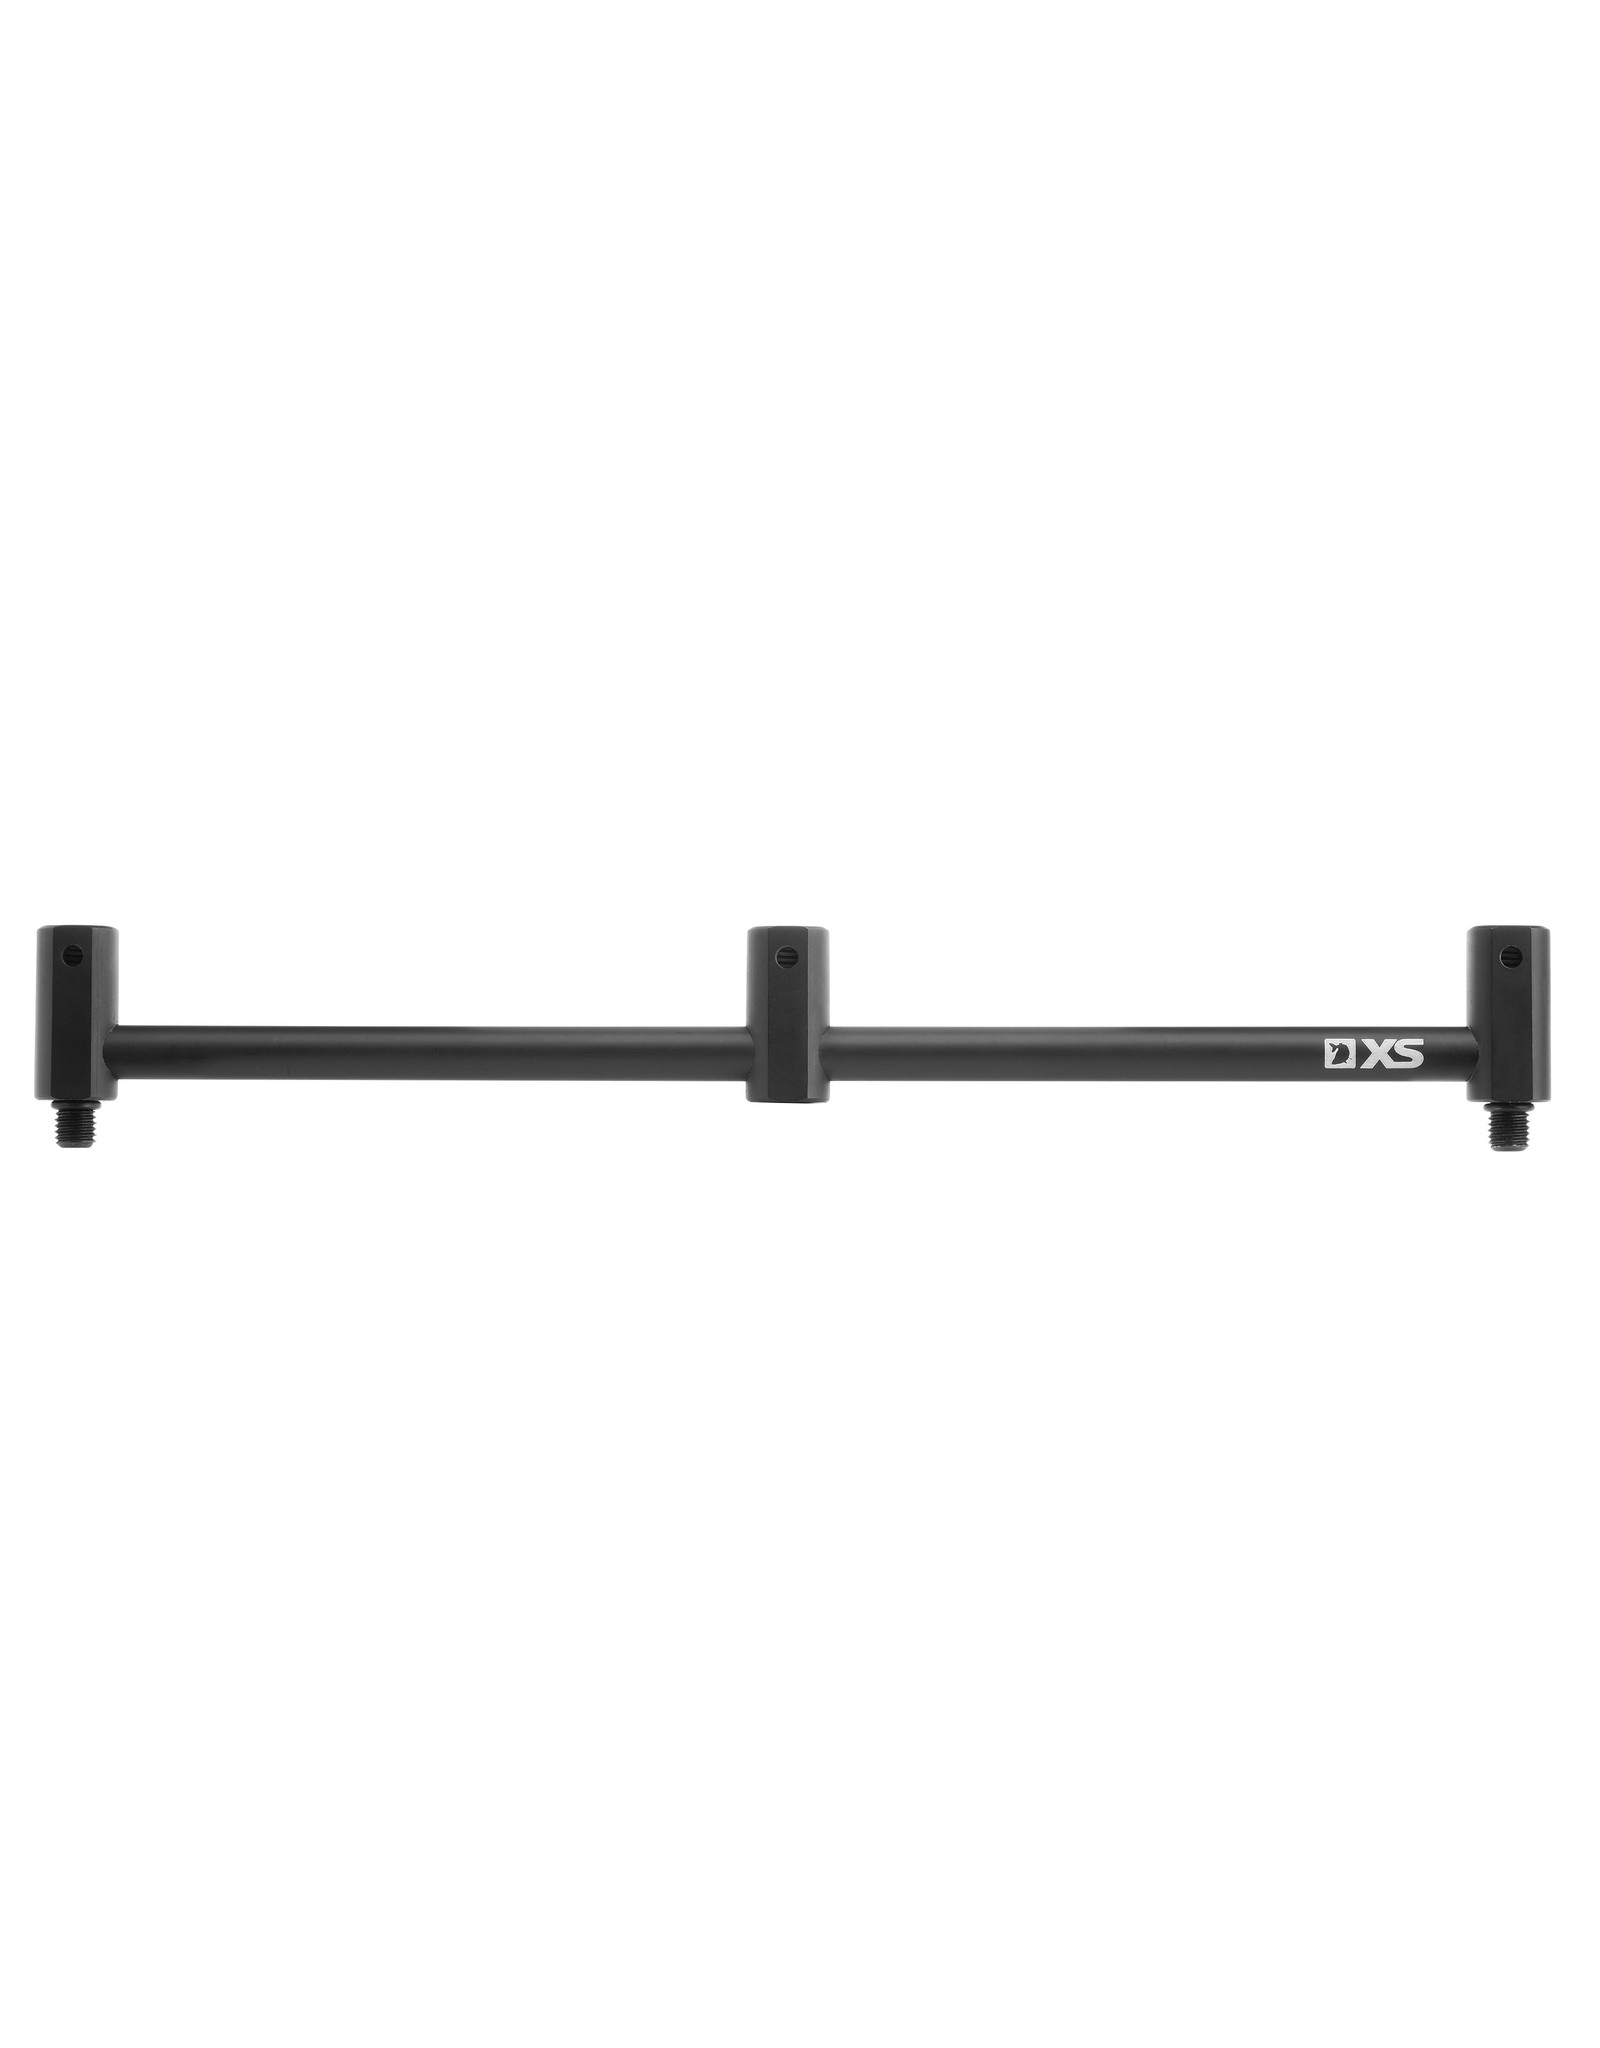 STRTG Strategy XS 3 Rod H Bar